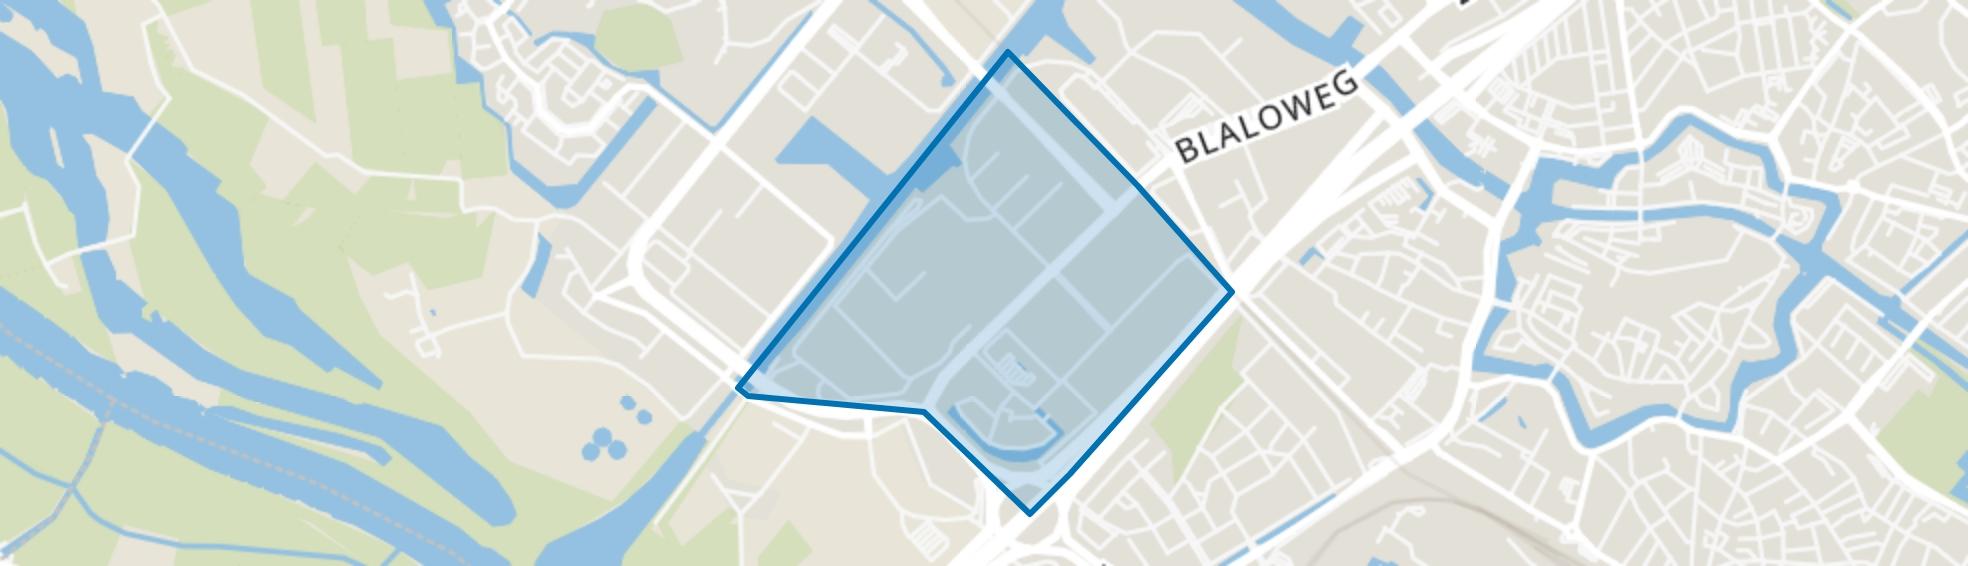 Bedrijventerrein Voorst-B, Zwolle map